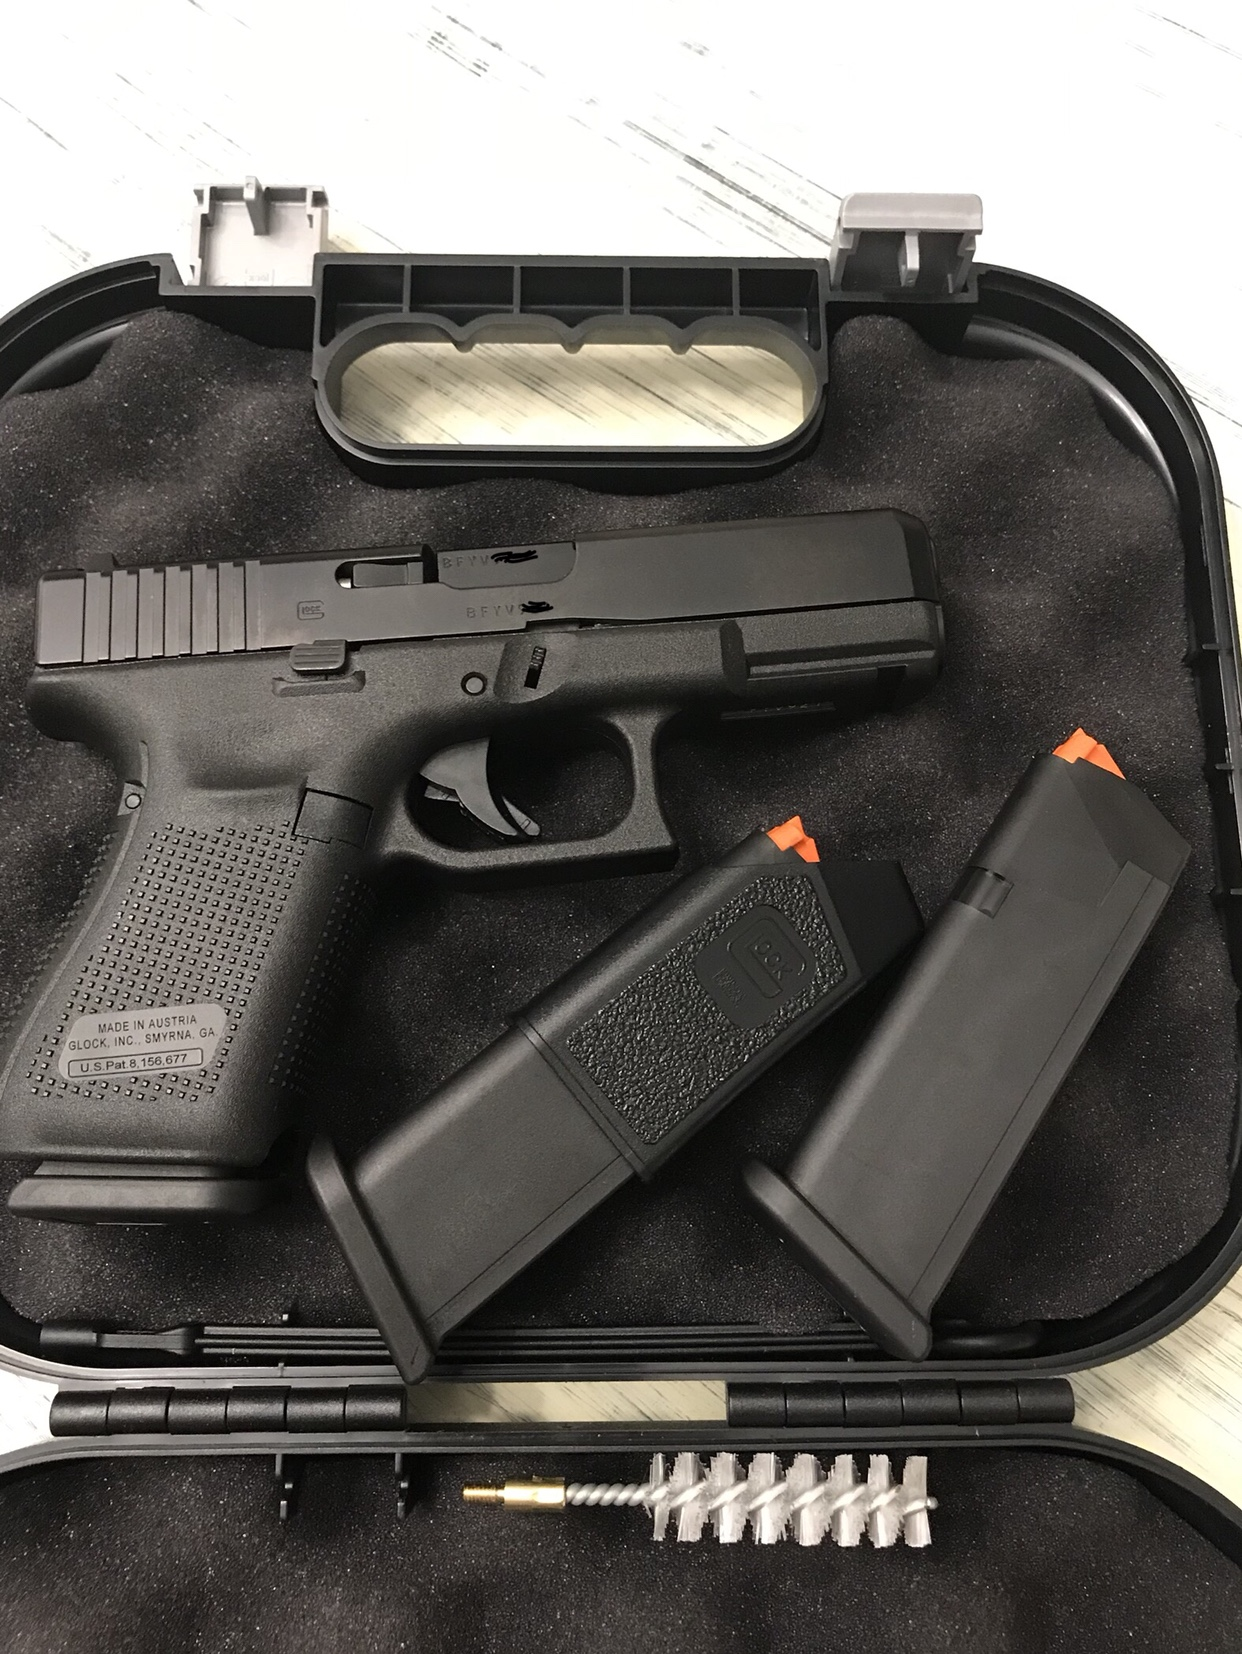 for sale glock 19 gen 5 glock 43 talo with ns sig talk